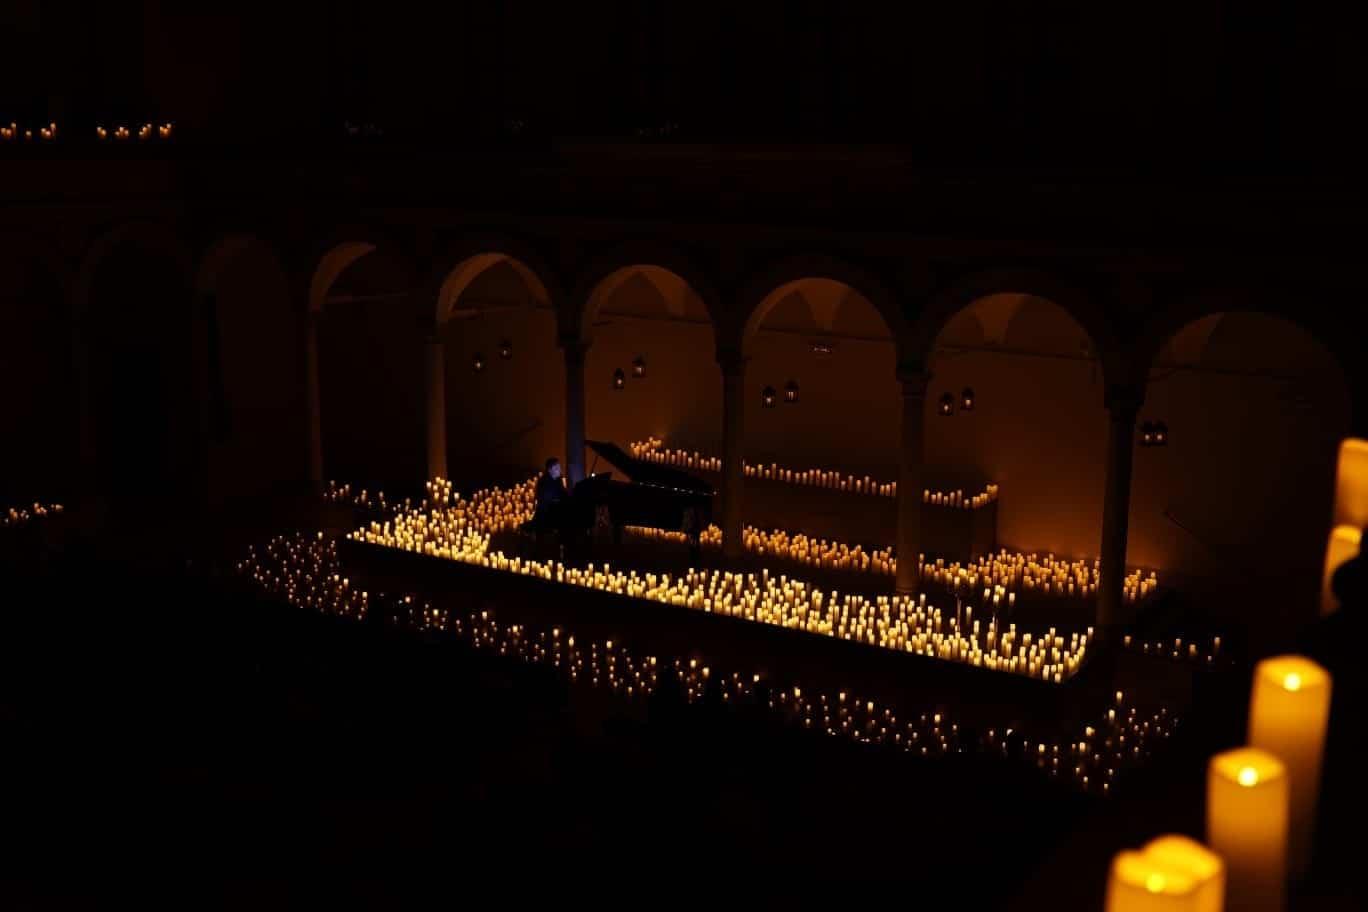 candlelight cartoni